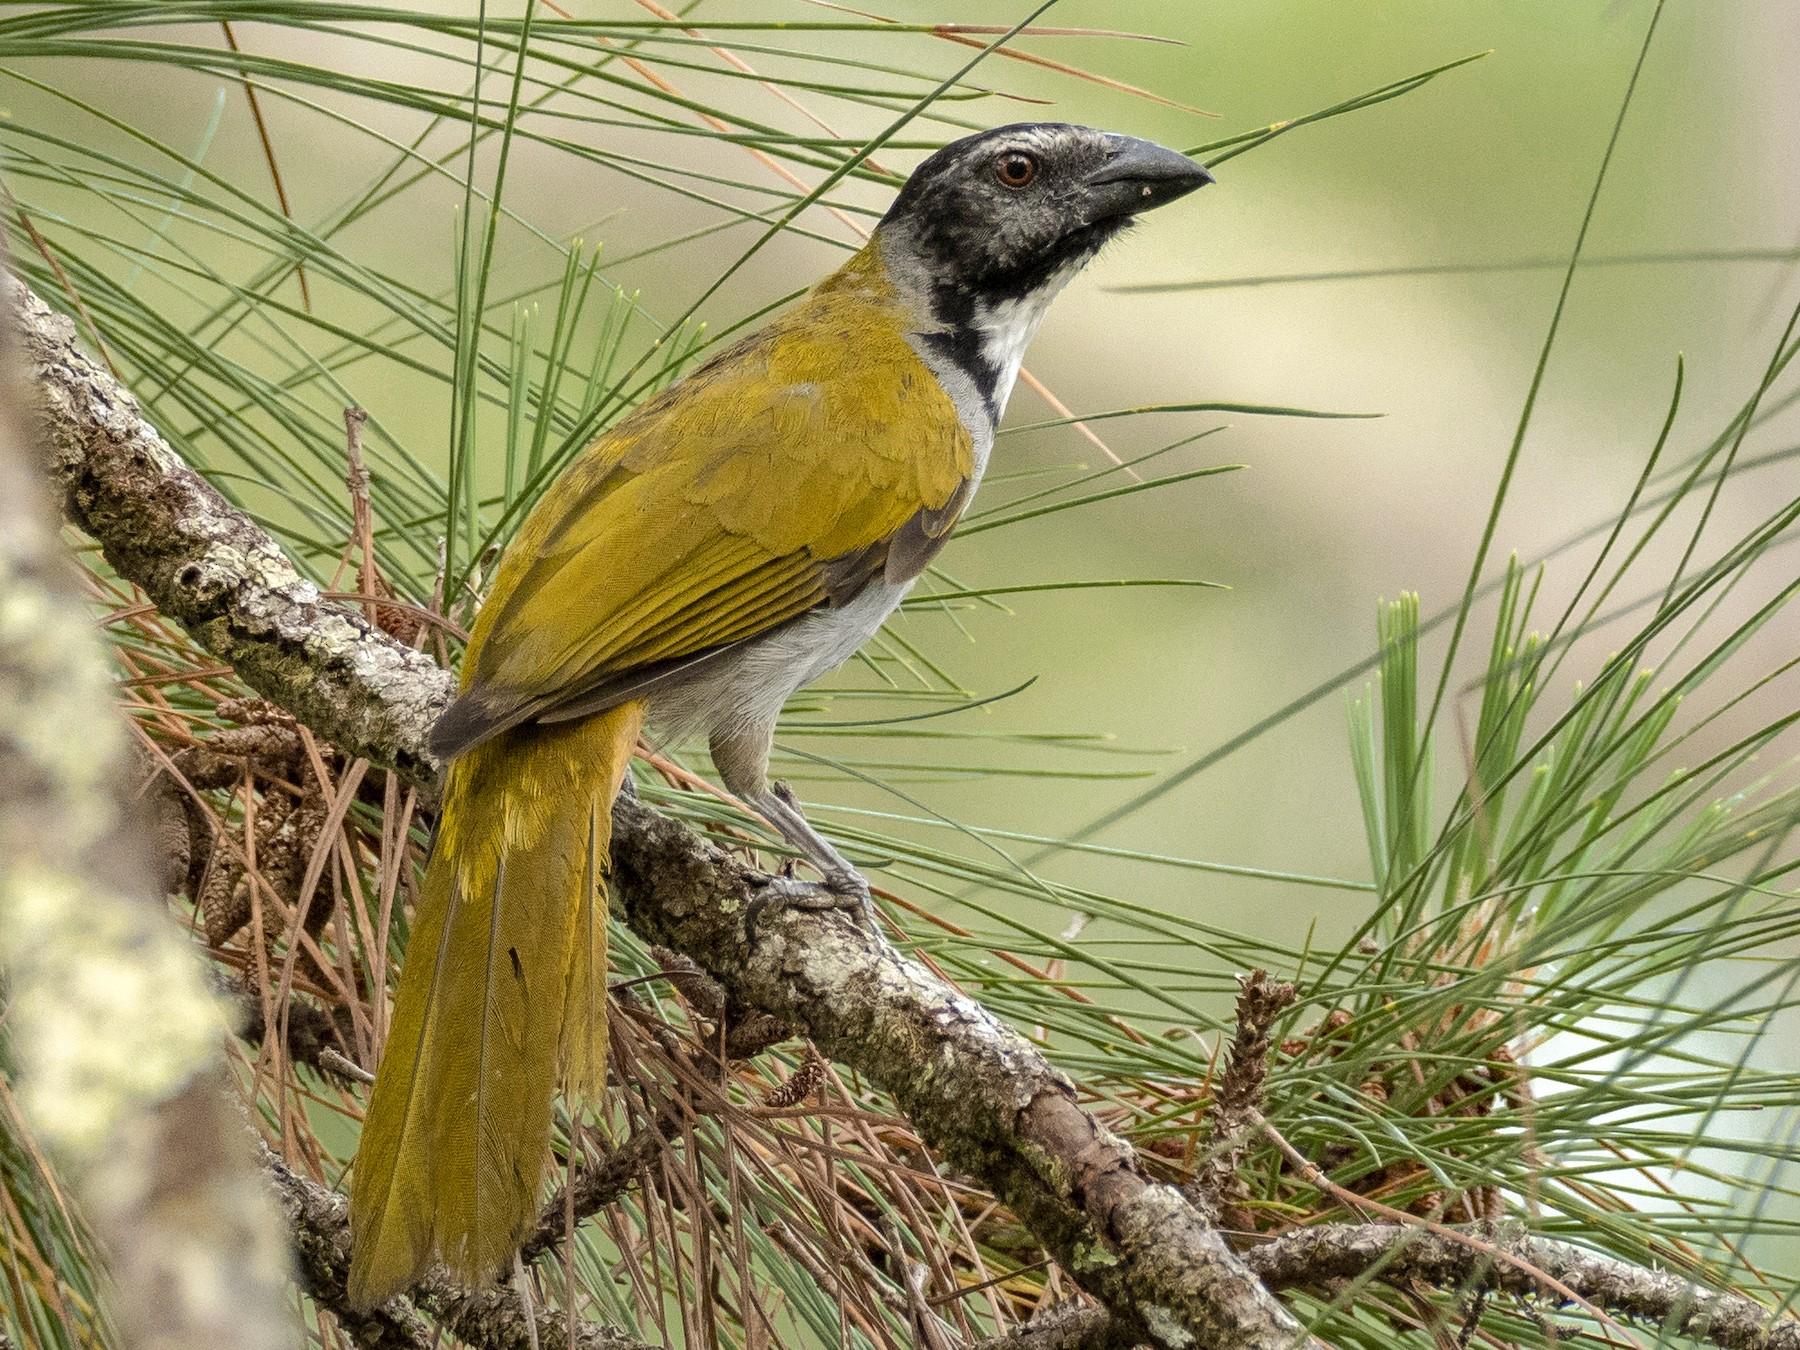 Black-headed Saltator - Andres Vasquez Noboa - Tropical Birding Tours